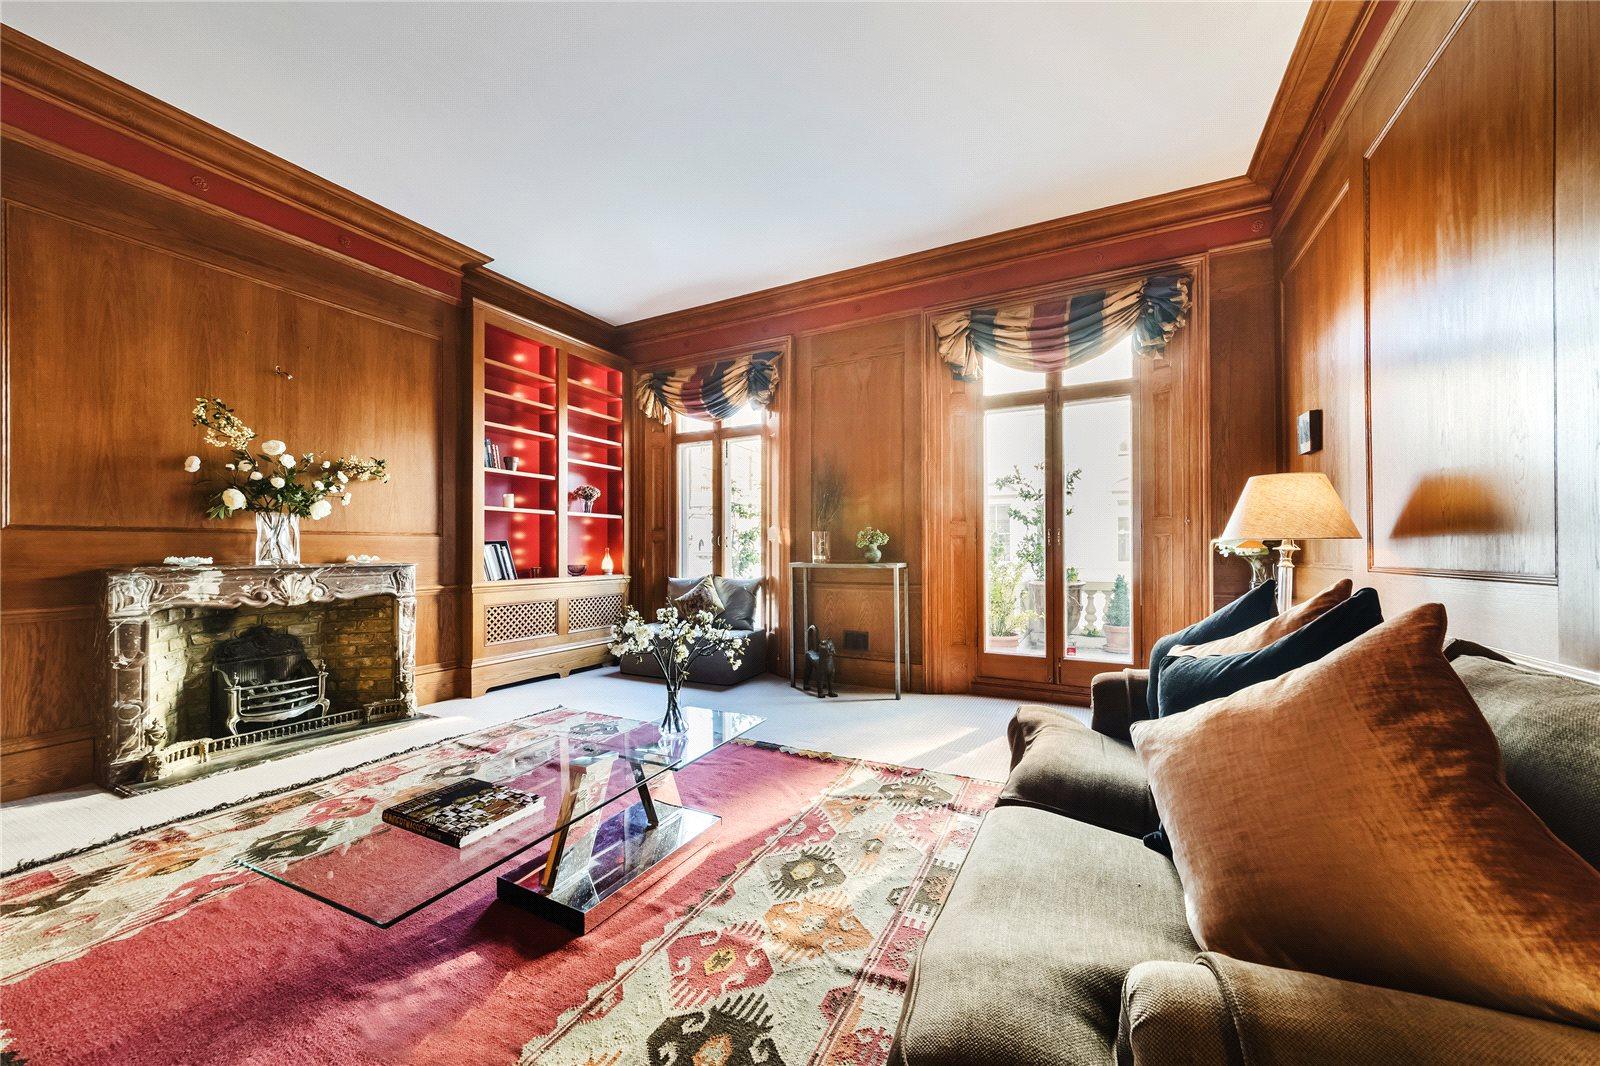 Apartments / Residences for Sale at Stanhope Gardens, South Kensington, London, SW7 South Kensington, London, England